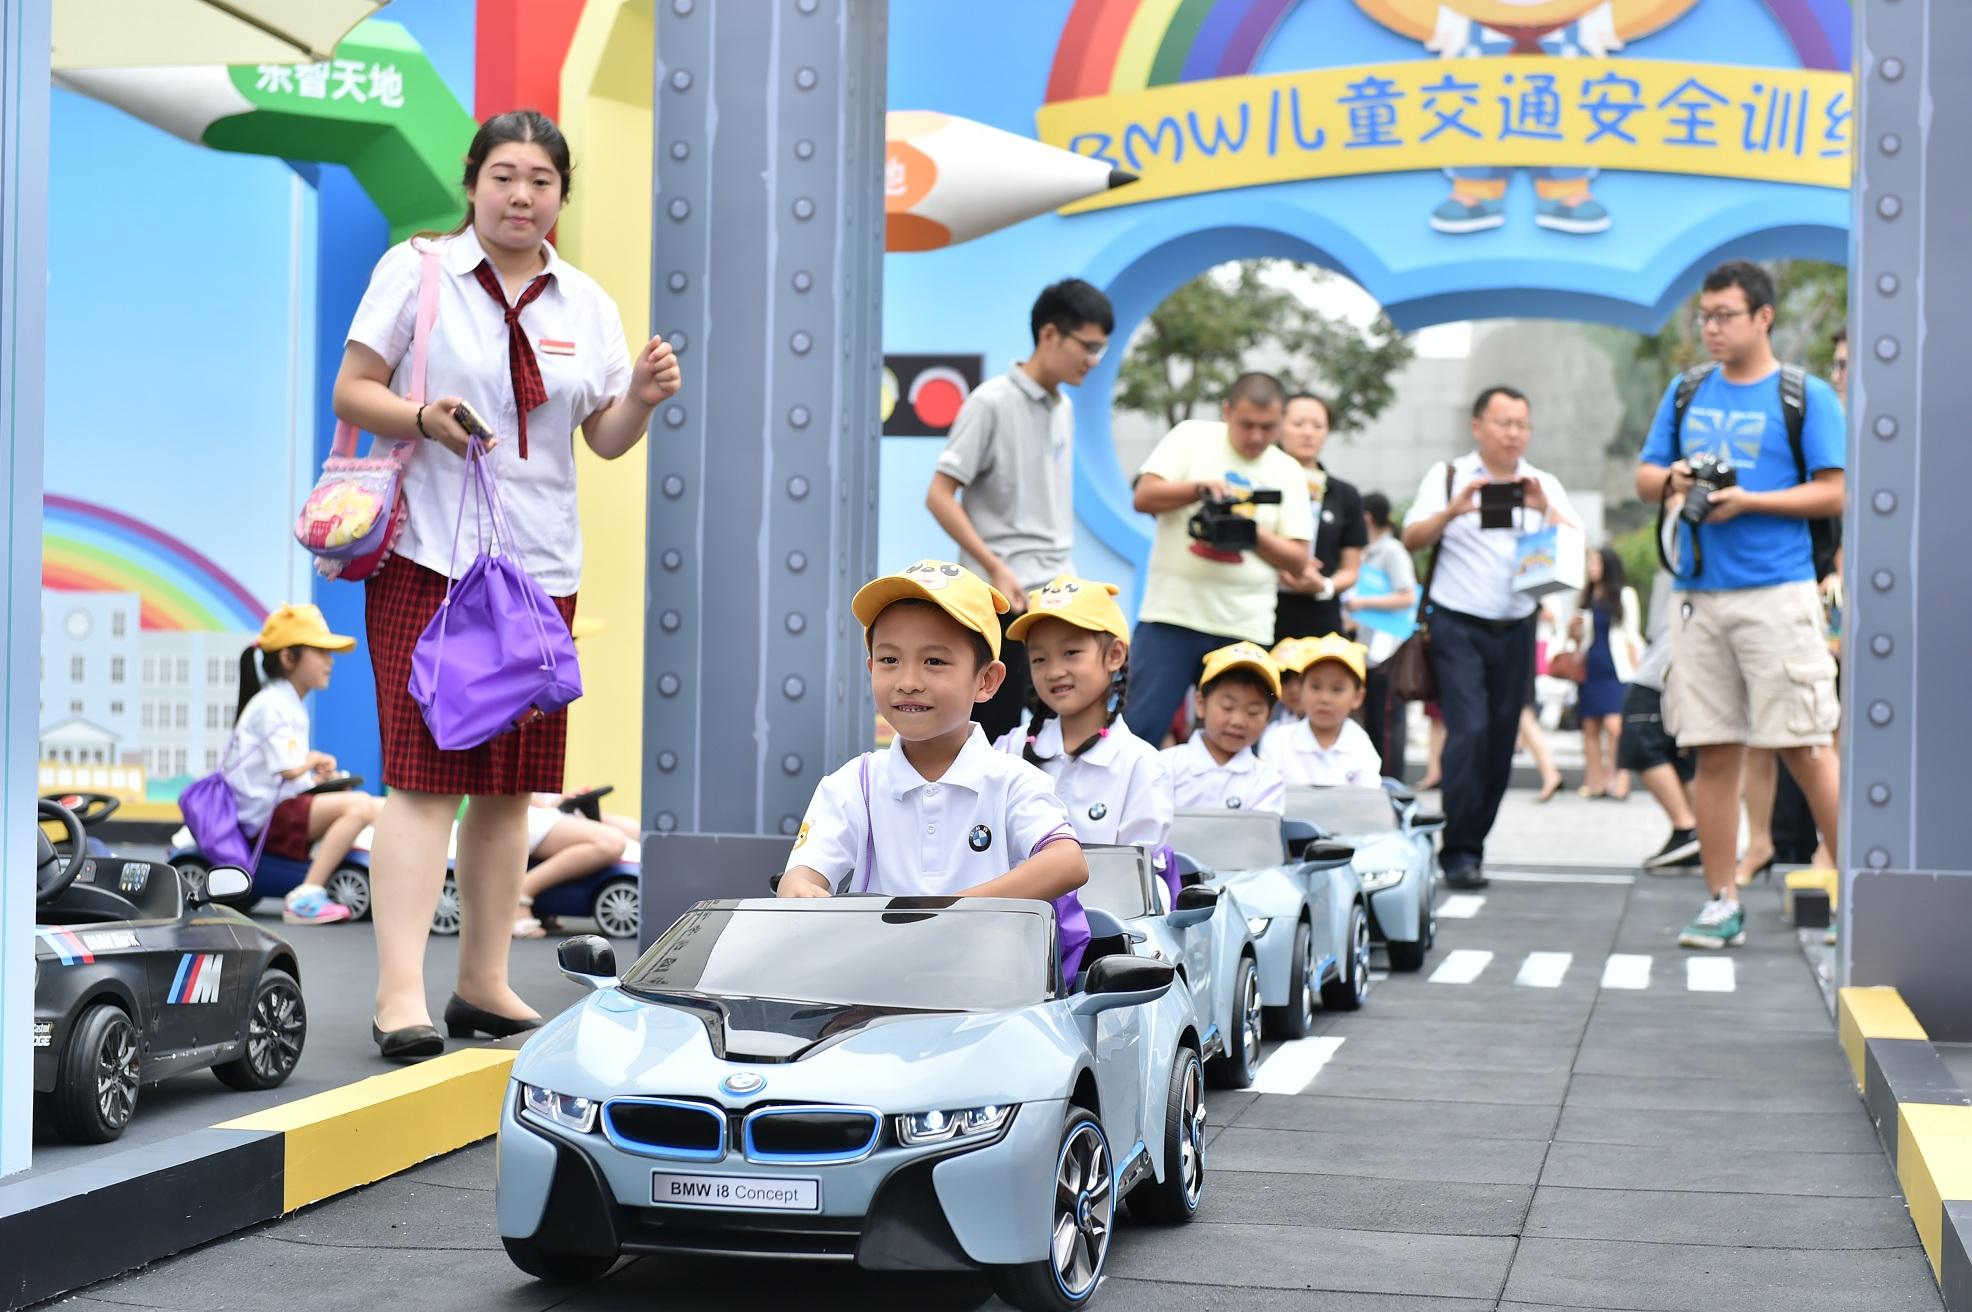 2015 bmw儿童交通安全训练营欢乐启幕